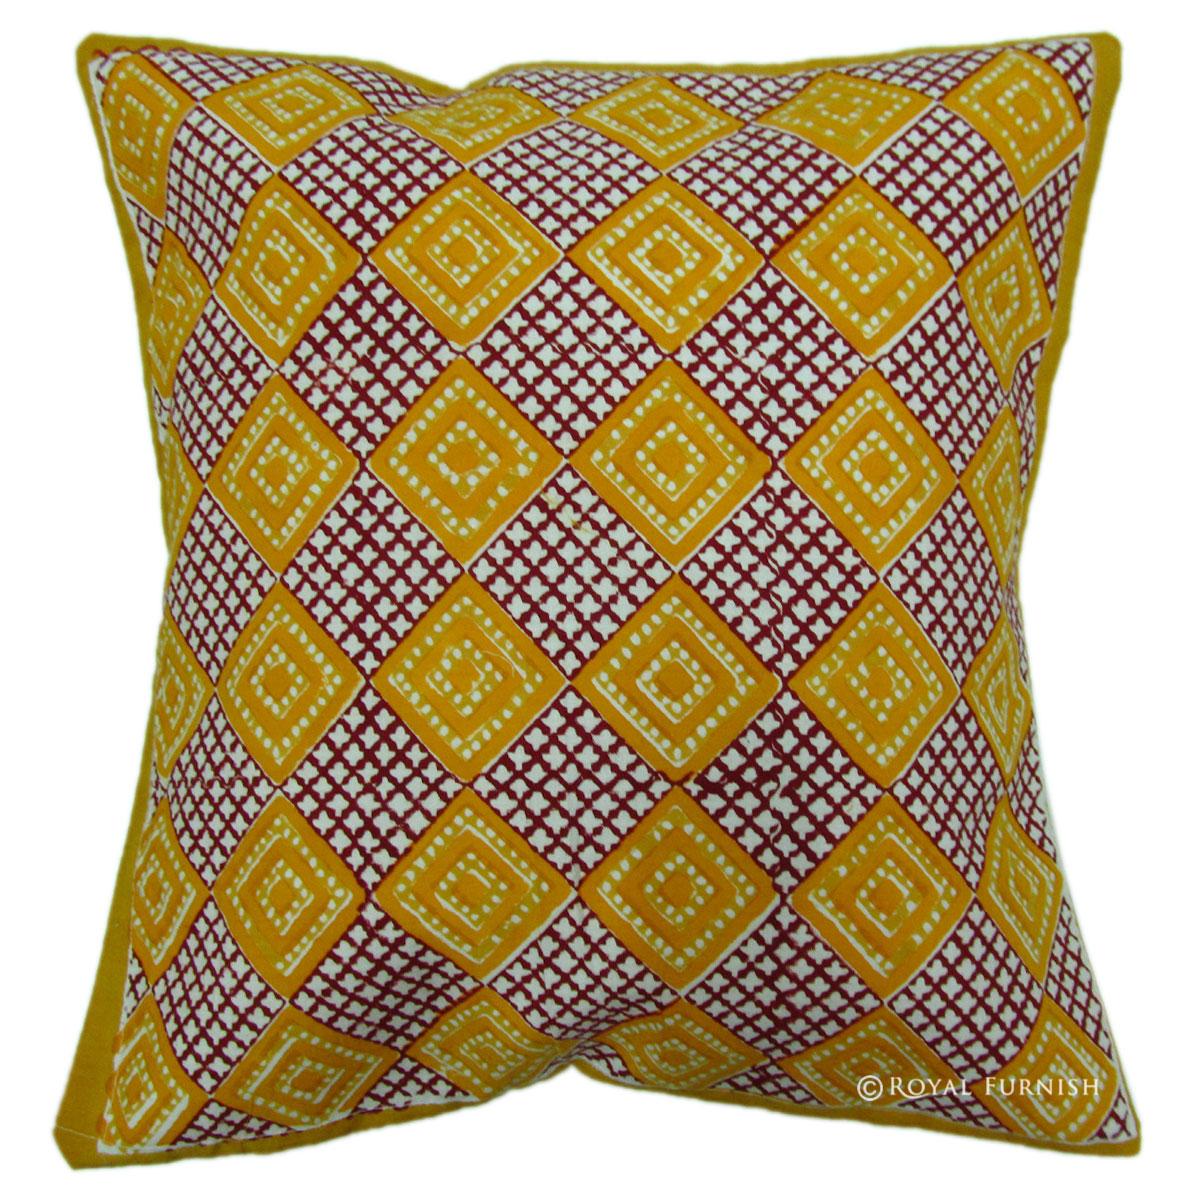 Orange Hand Block Contemporary Decorative Accent Pillow Cover - RoyalFurnish.com